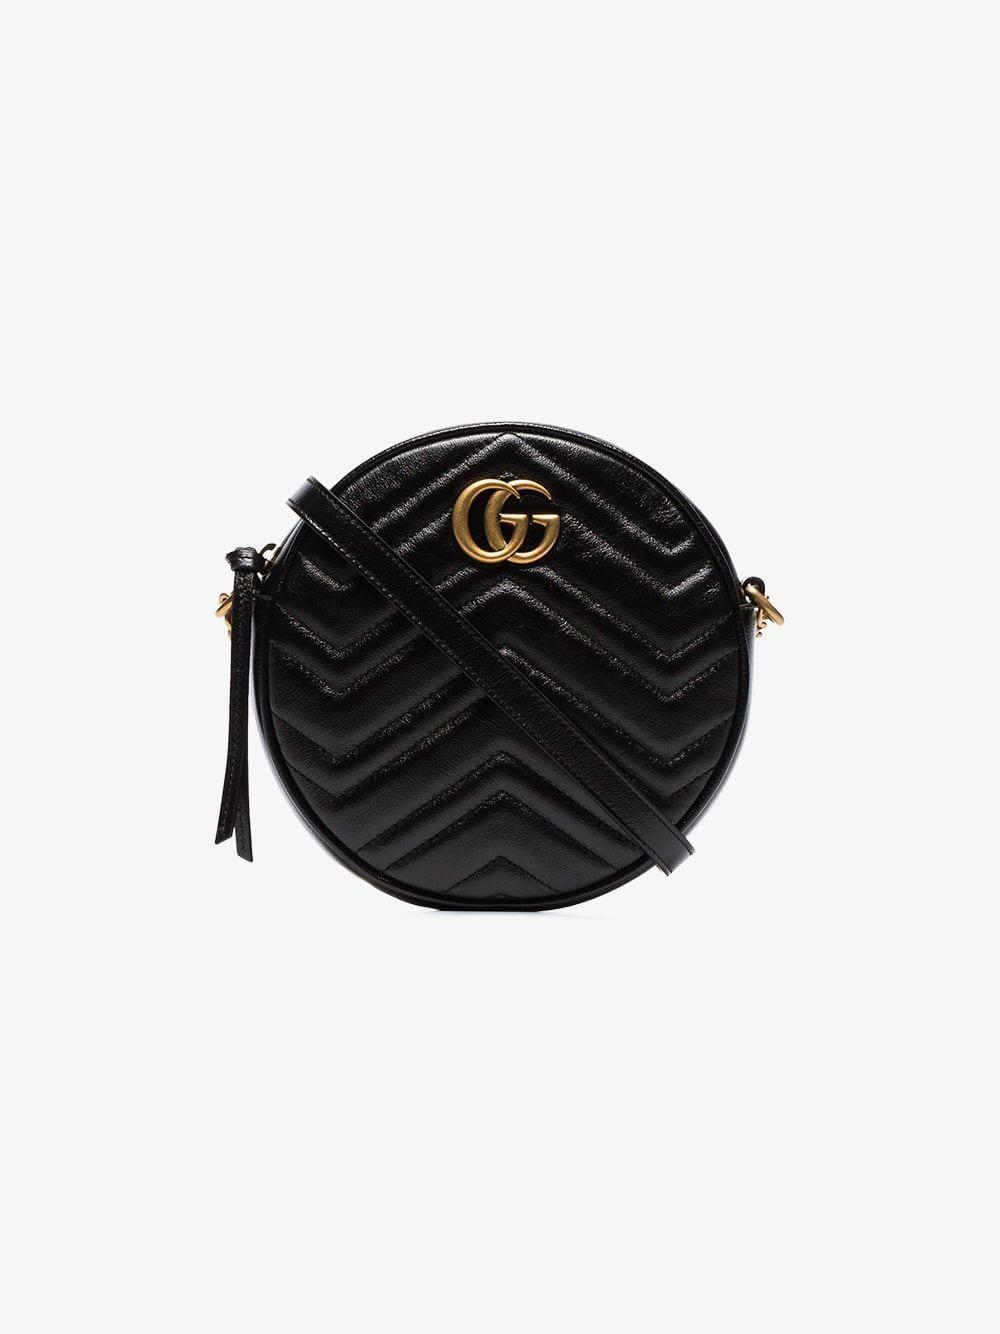 367f0931f354 Gucci Black GG Marmont Mini Round Shoulder Bag in Black - Lyst